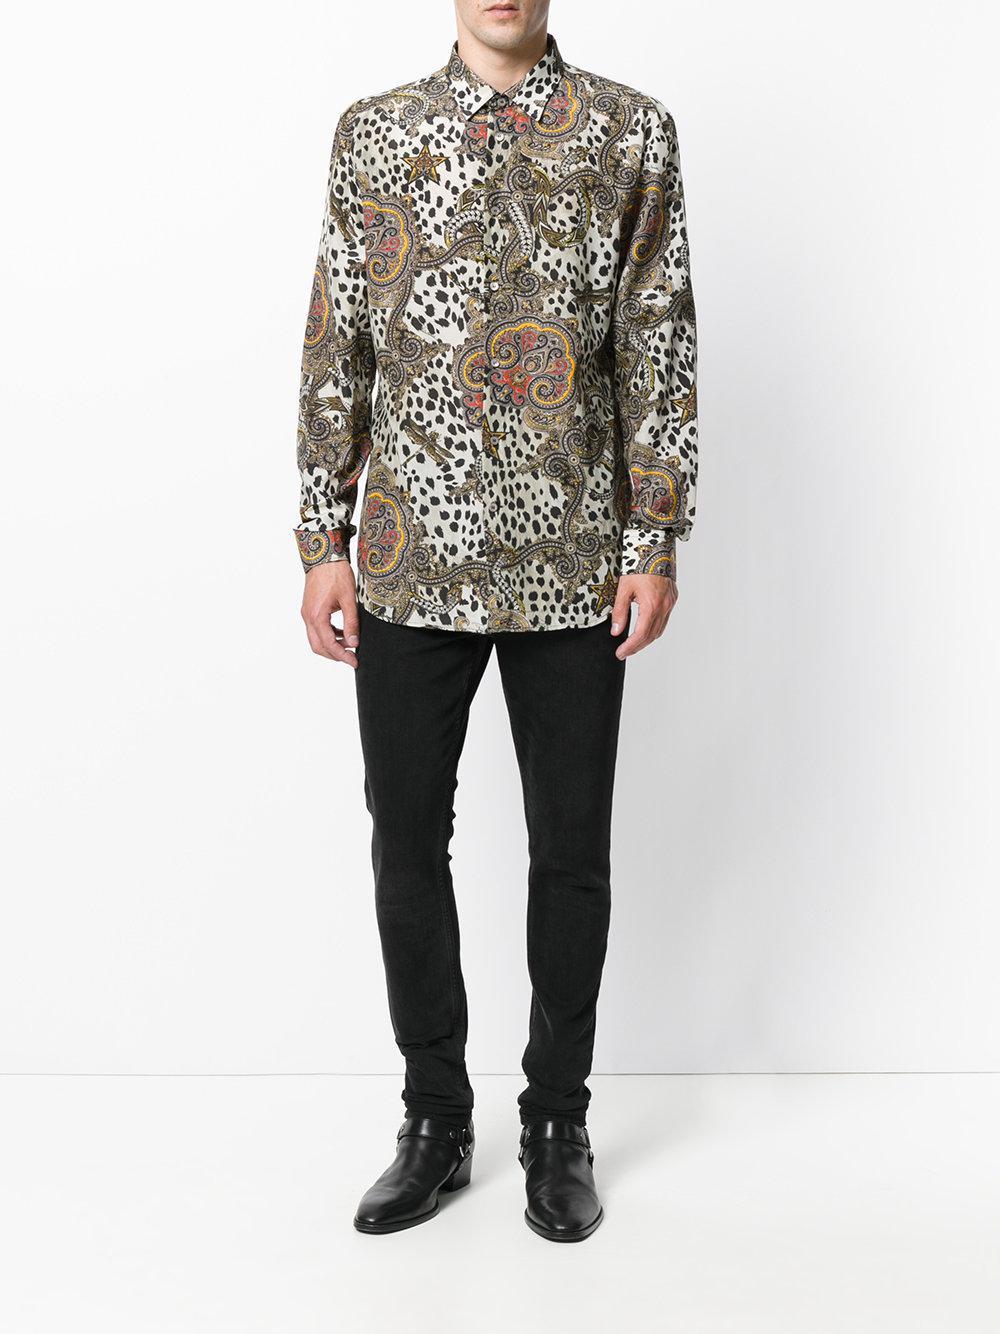 251d107c269240 Lyst - Roberto Cavalli Leopard Paisley Print Shirt in White for Men